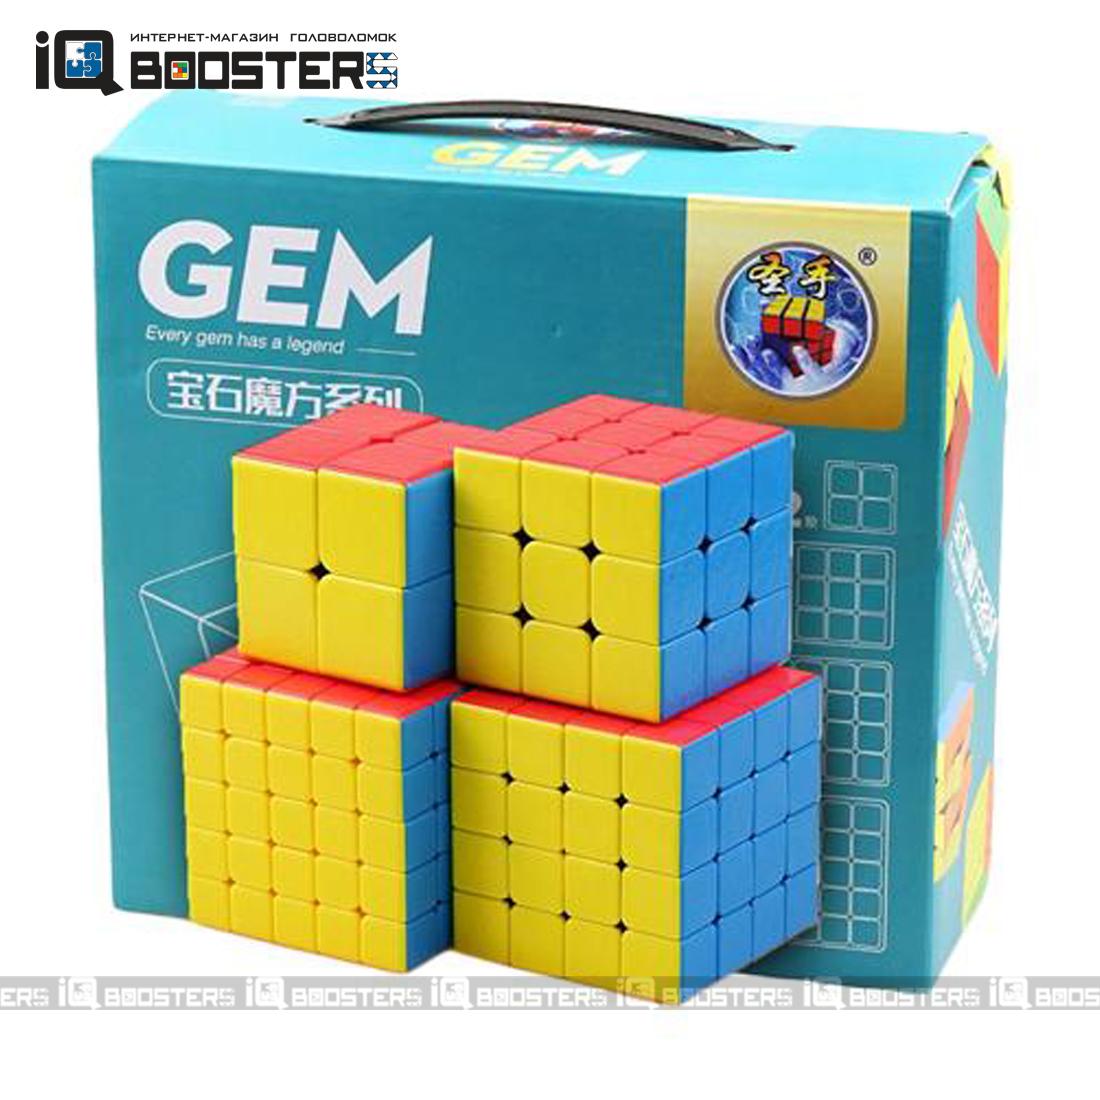 ss_gem_gift_box_2